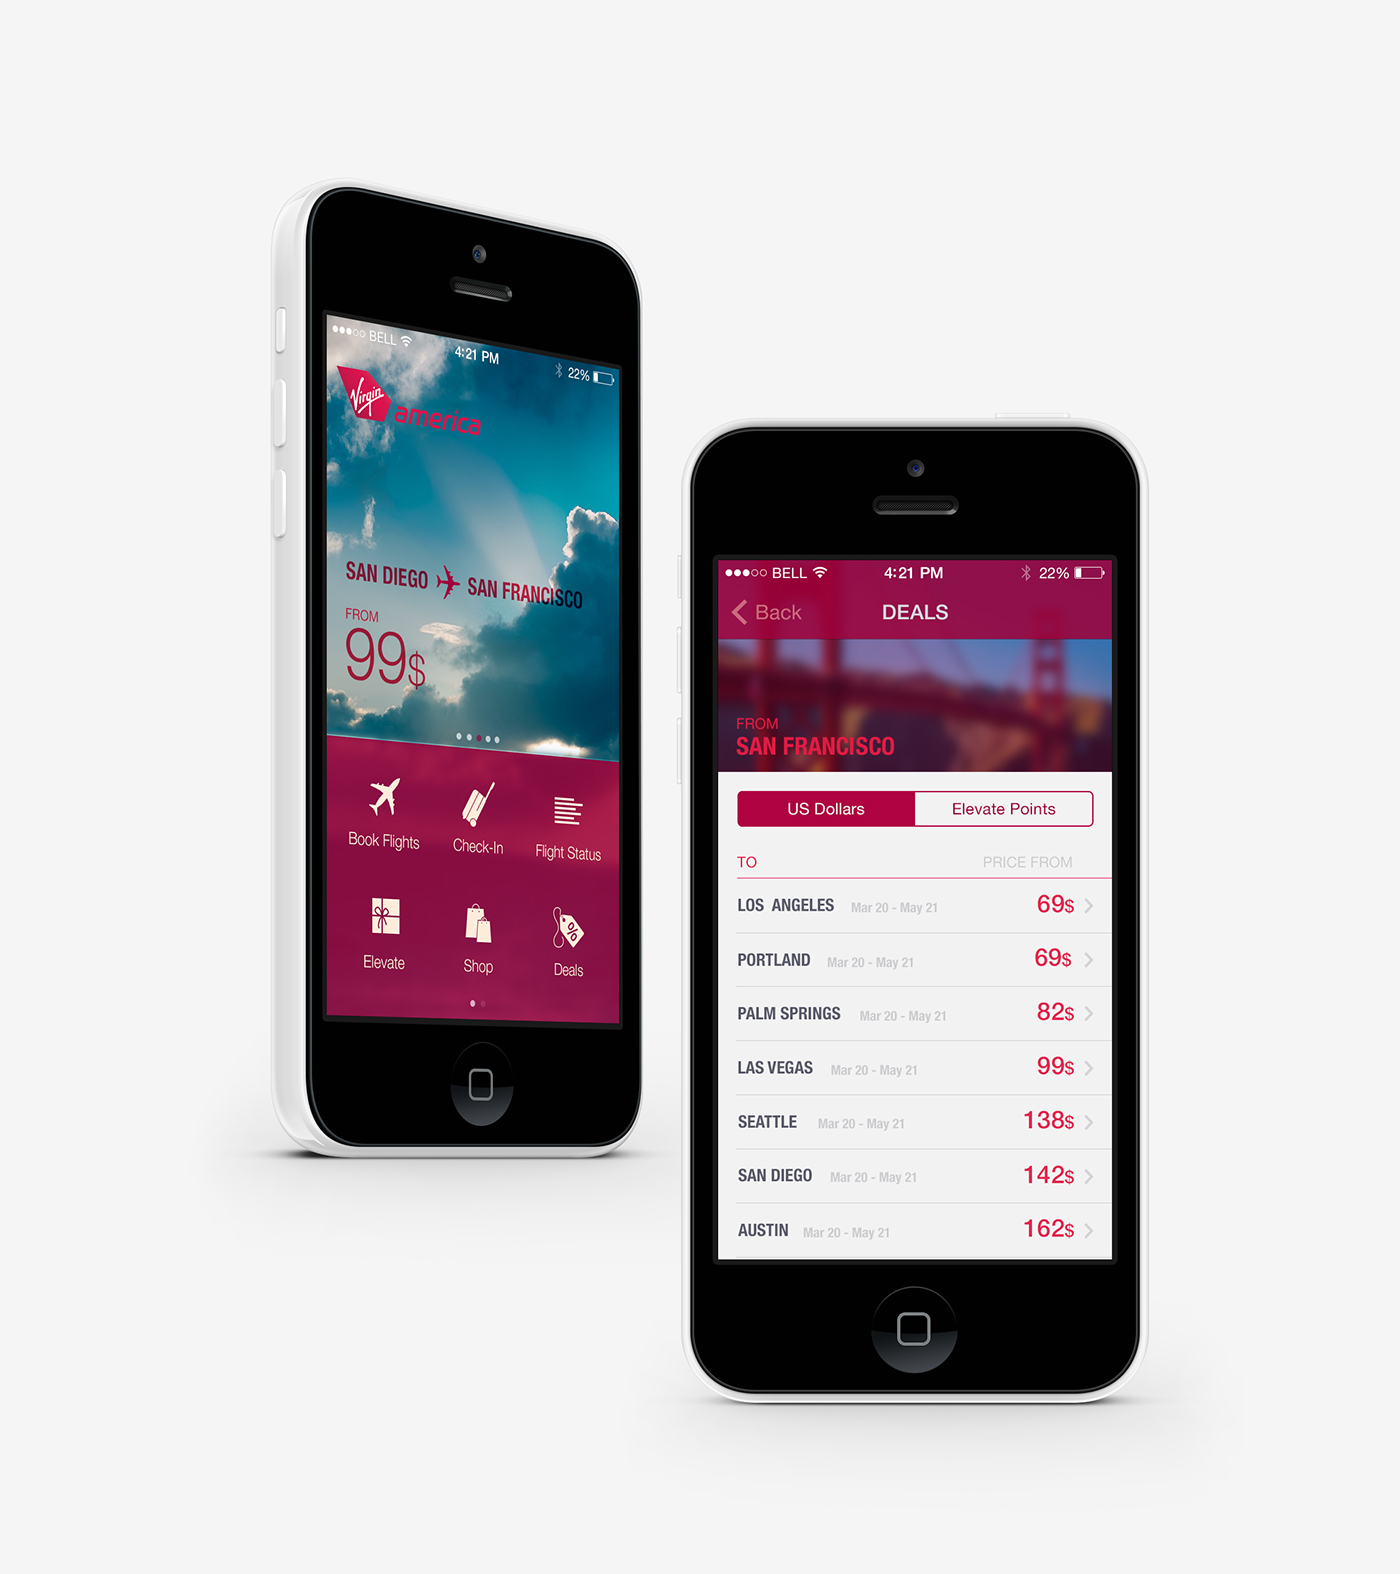 user interface design visual design Mobile User Interfaces User Experience Design iphone app Flight app